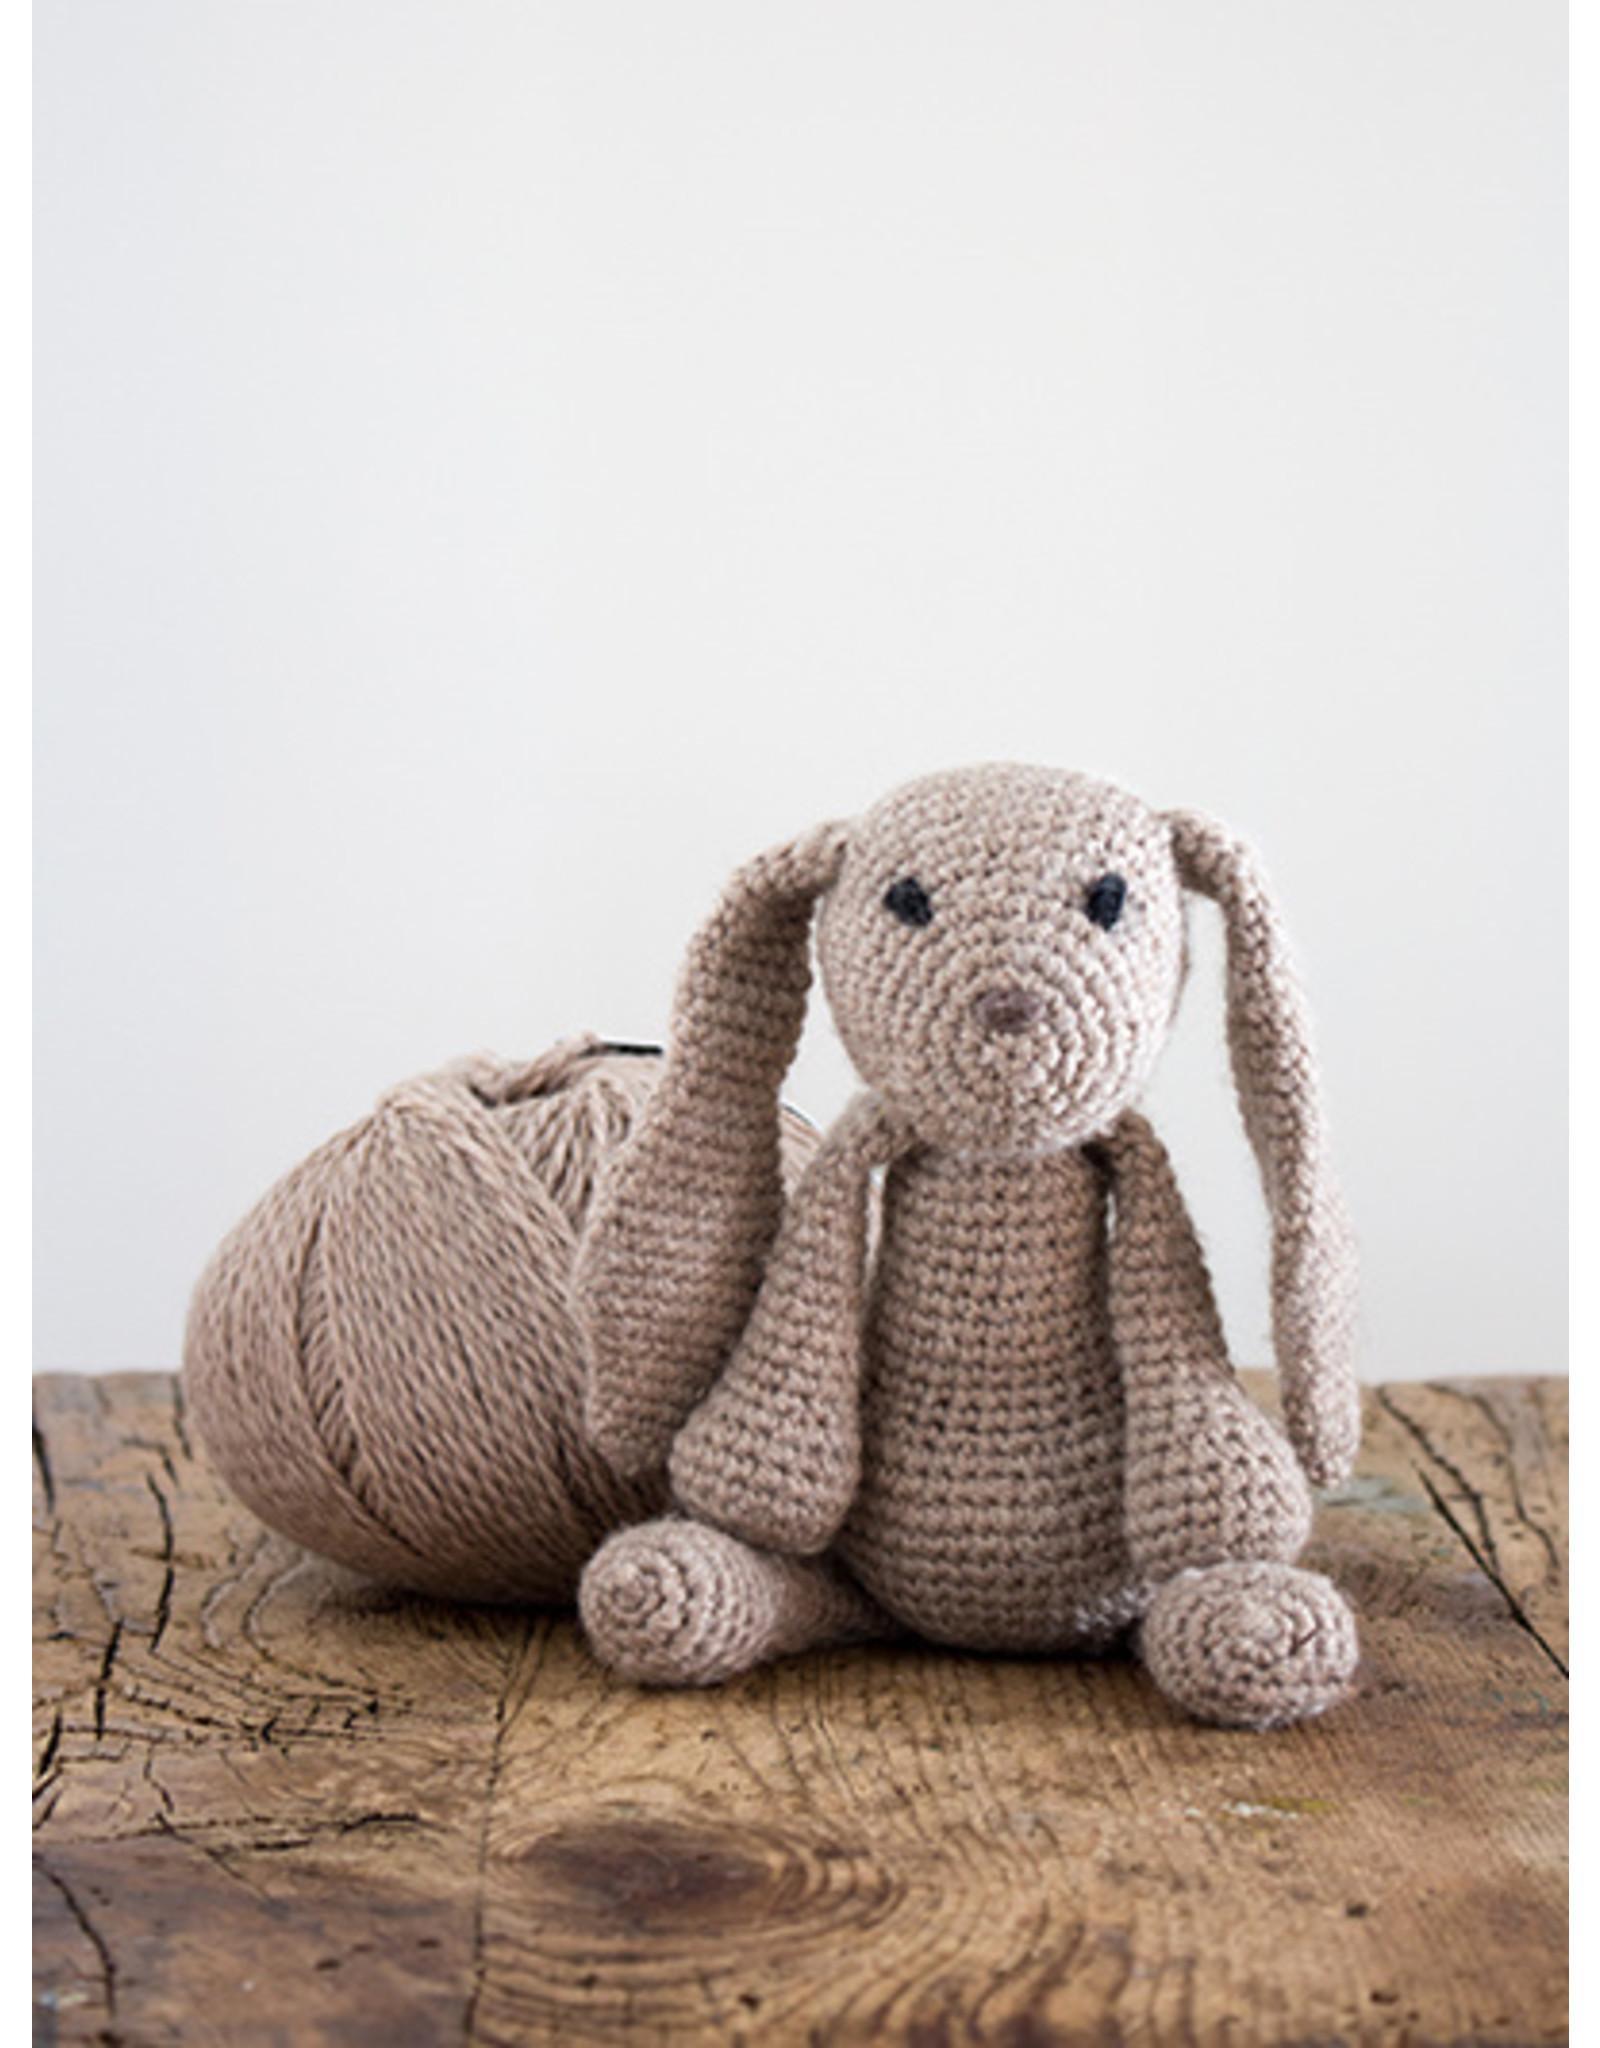 Crochet Class: Amigurumi Animals